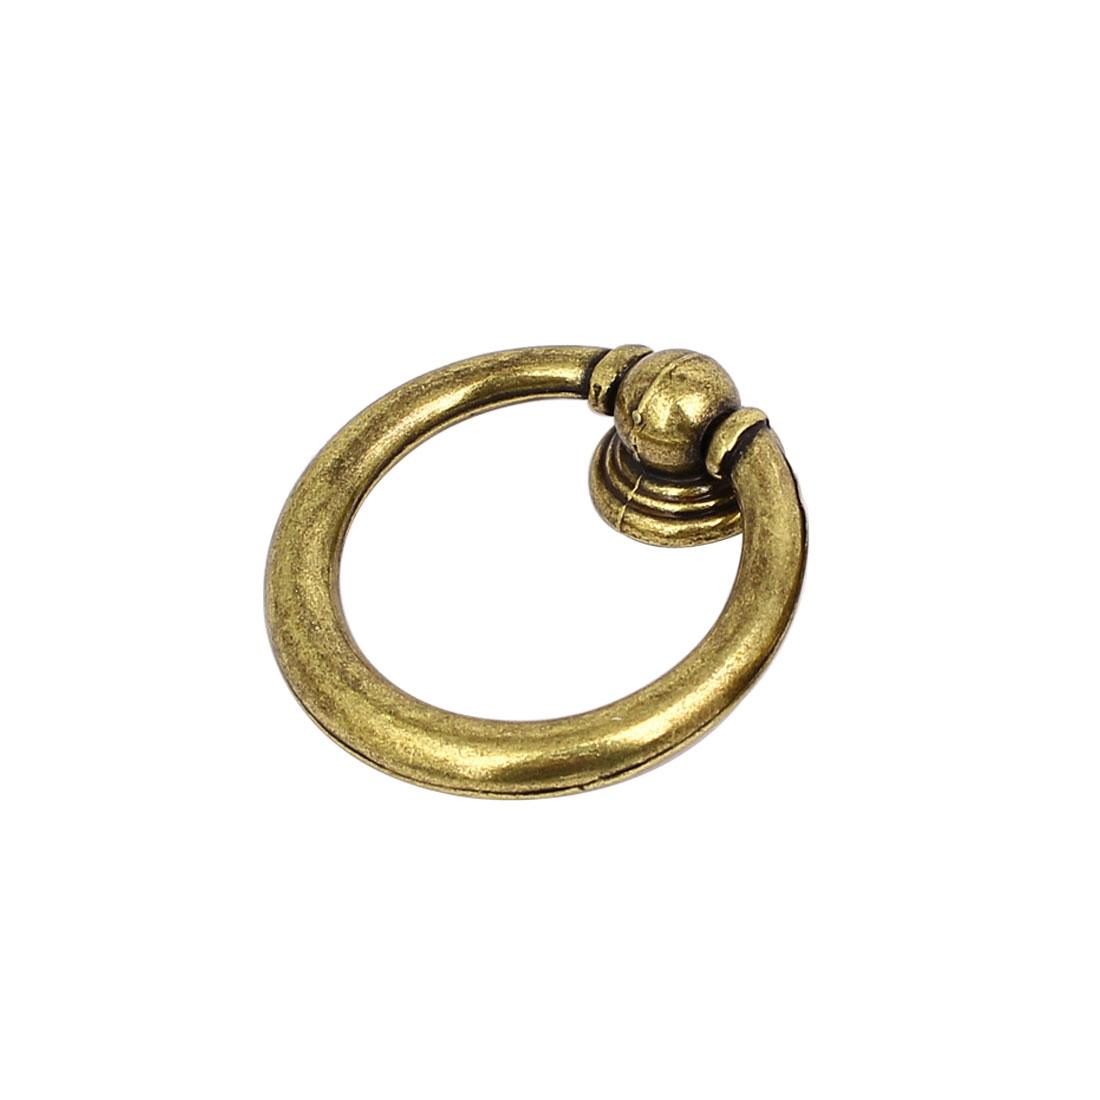 Drawer Dresser Retro Style Metal Round Pull Handle Ring Bronze Tone